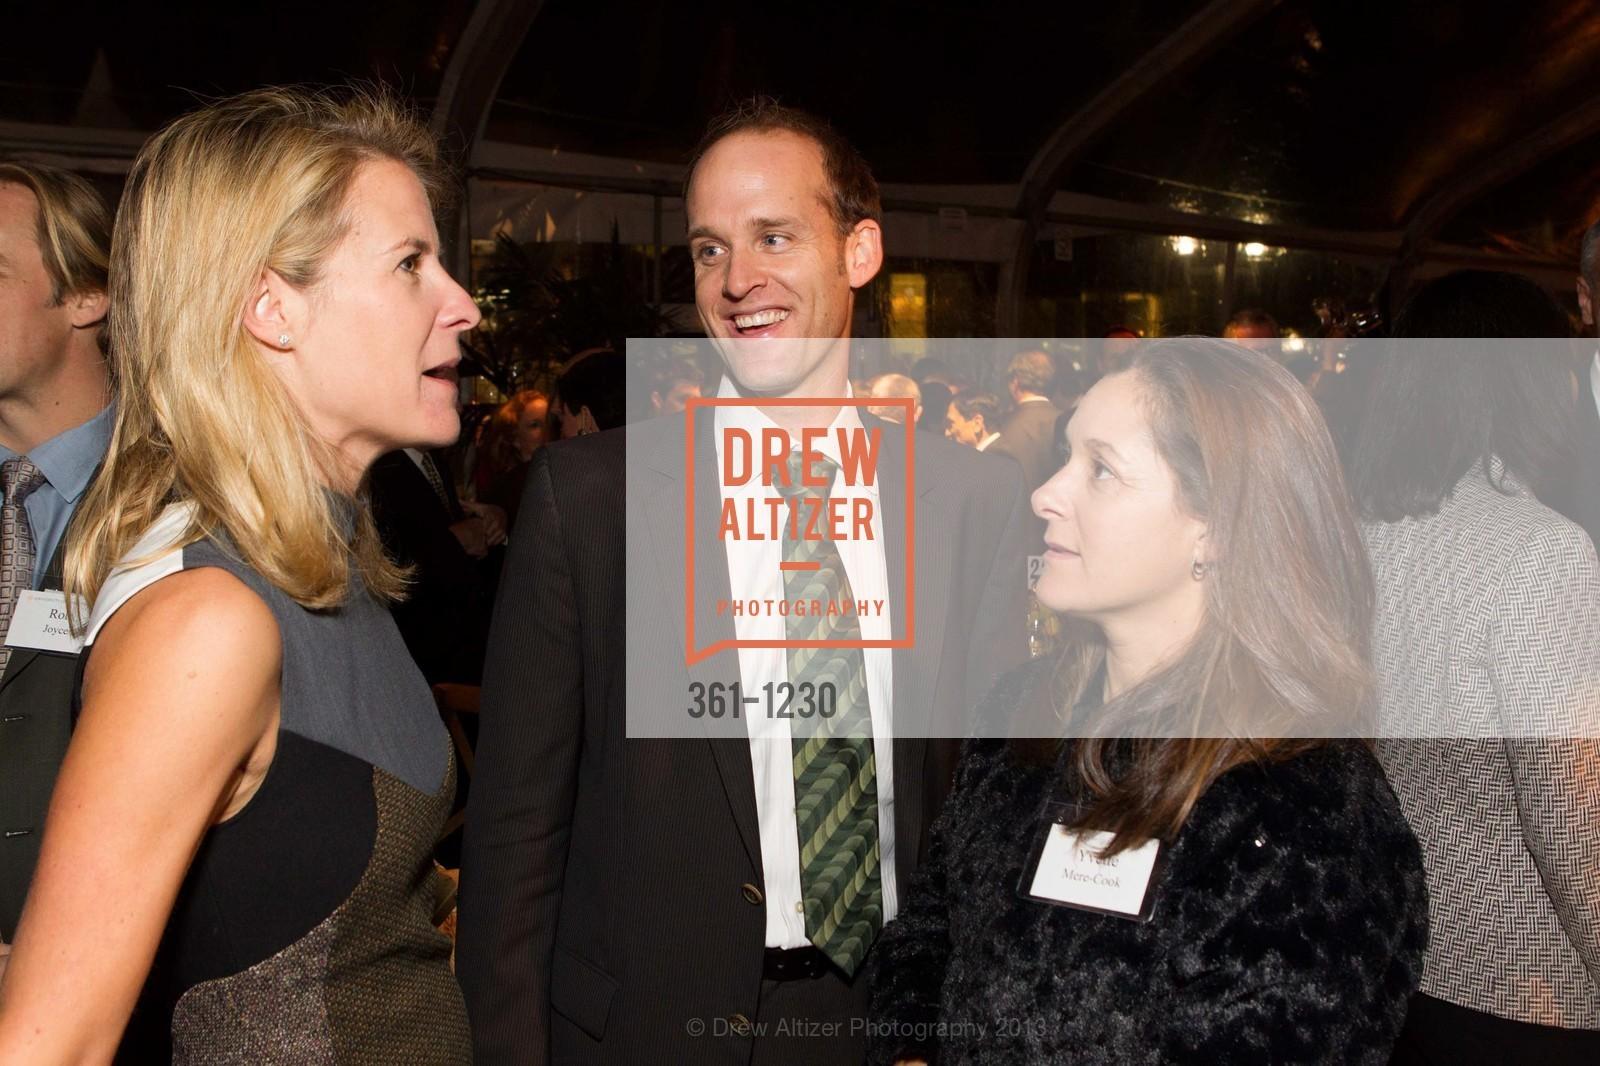 Catarina Schwab, Corey Cook, Yvette Mere-Cook, Photo #361-1230